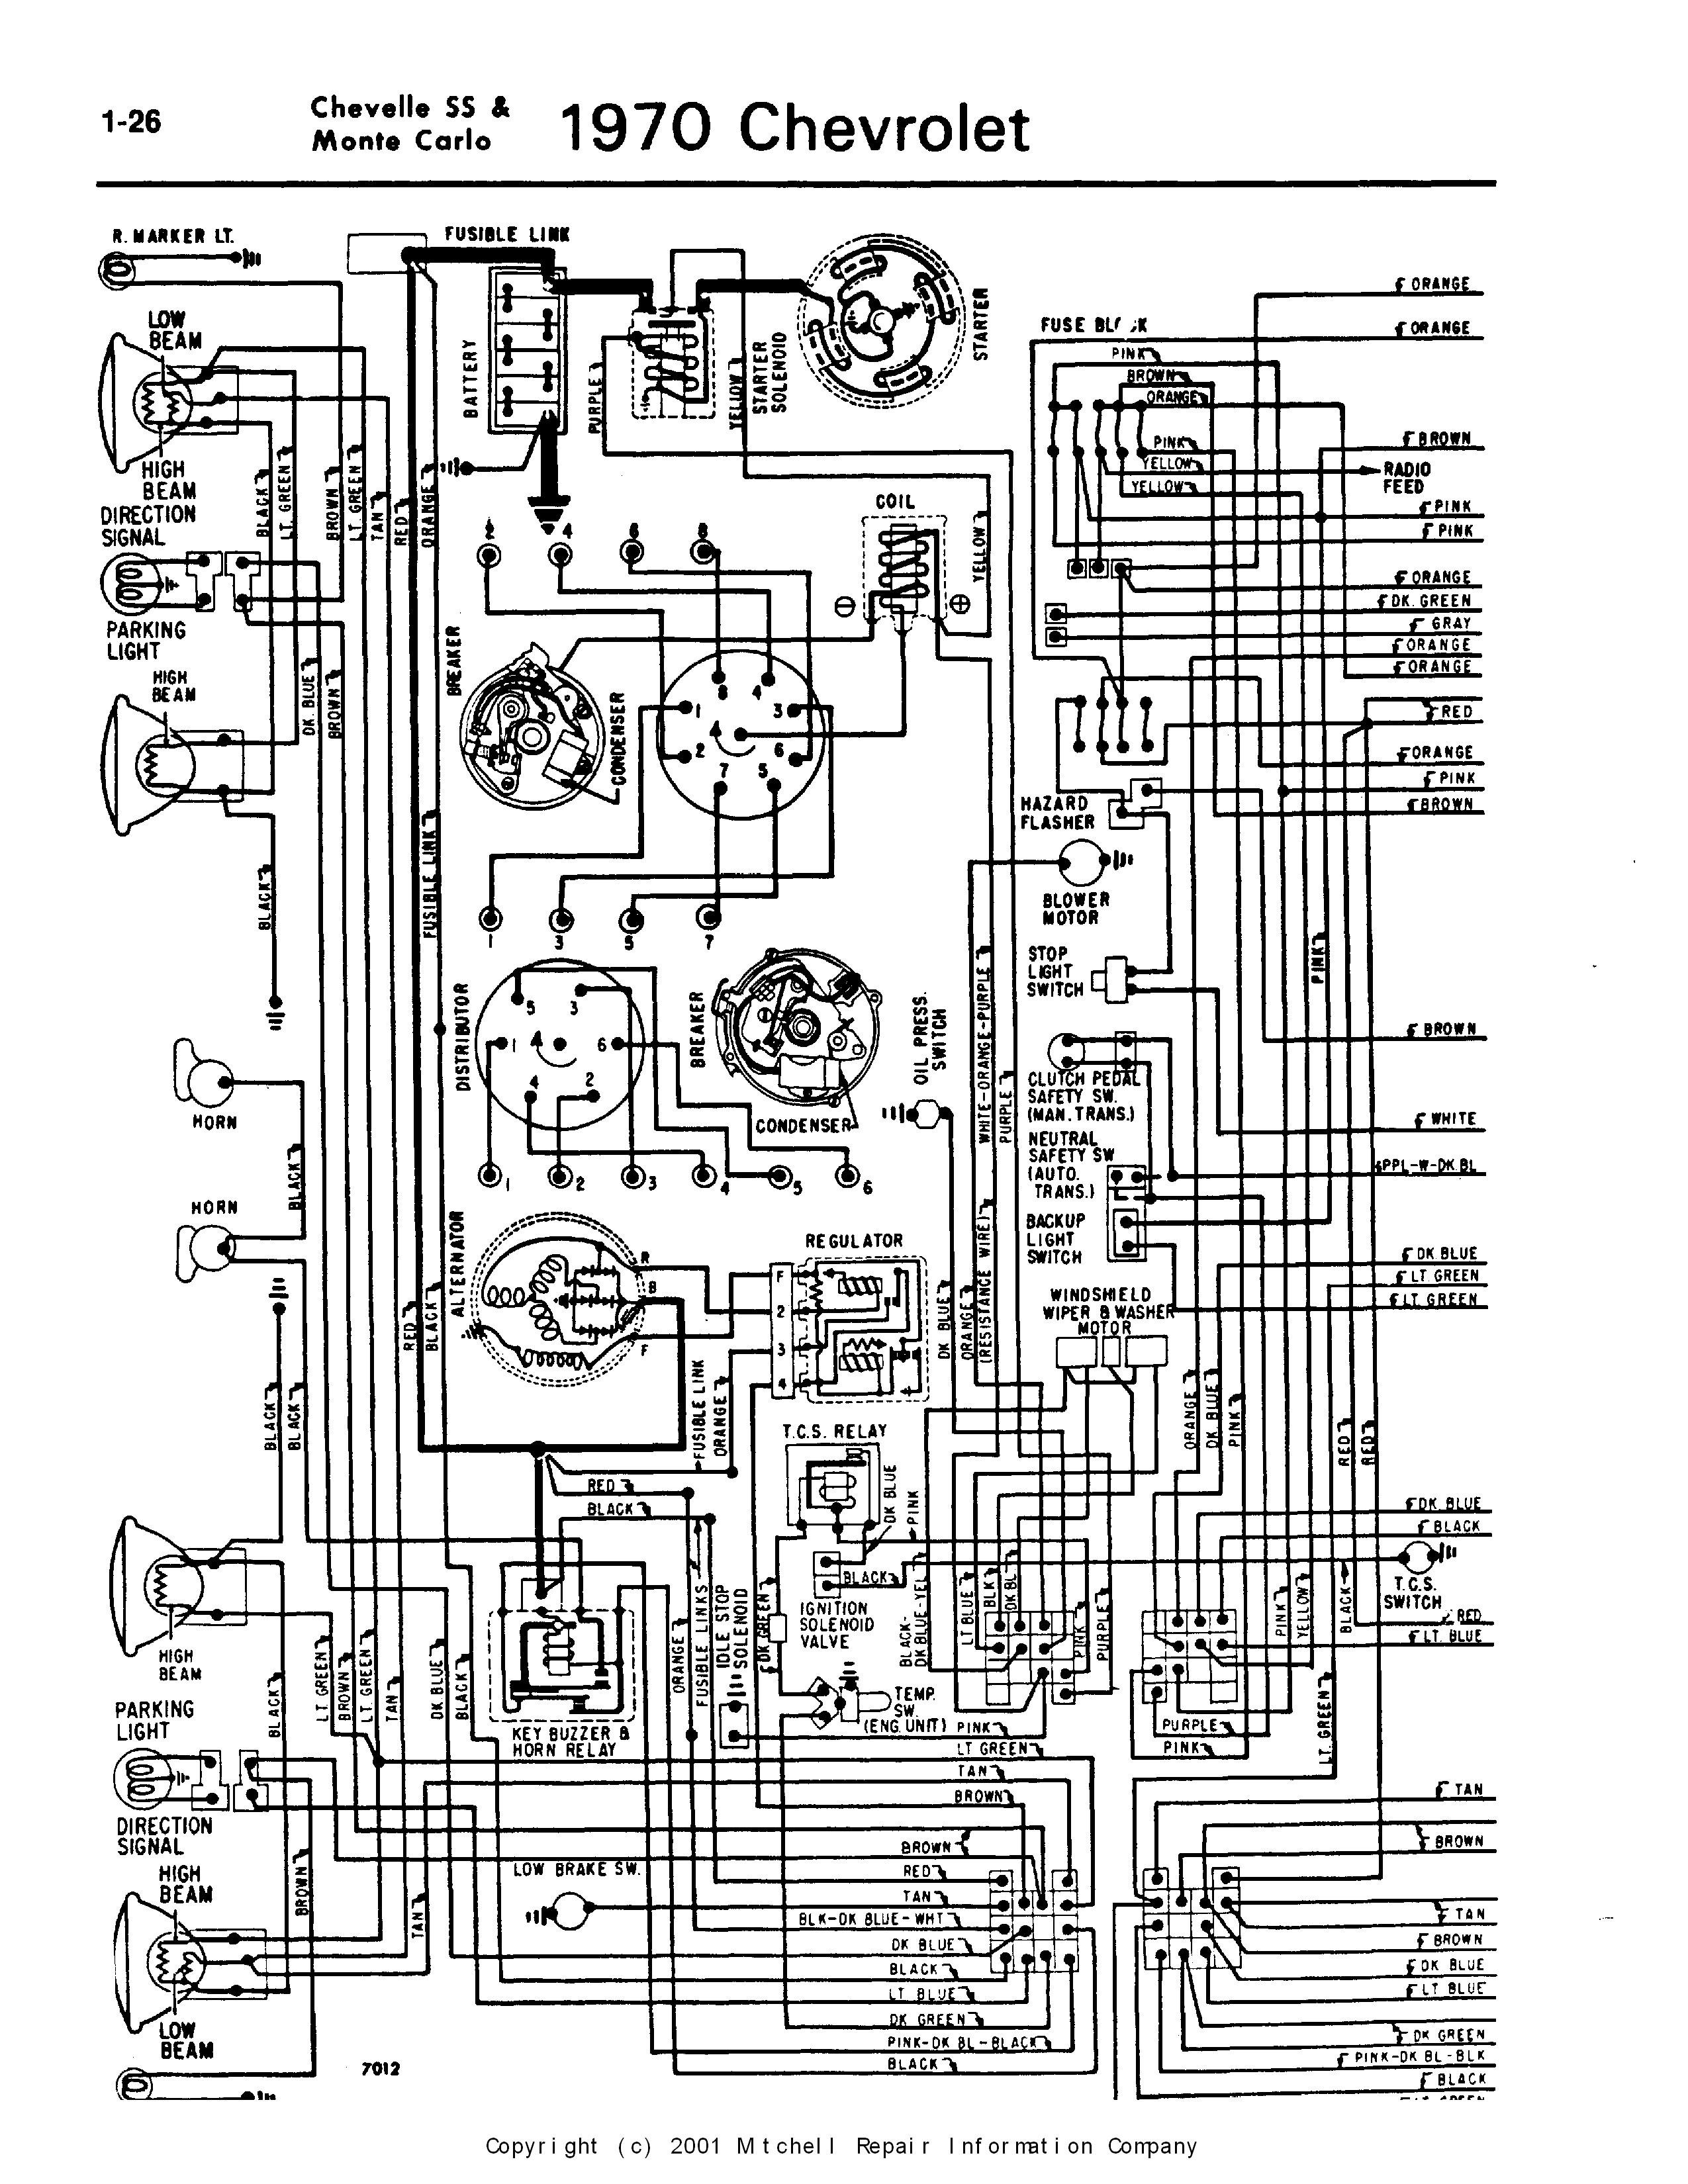 wiring diagram 1970 el camino ss 396 get free image about wiringChevy El Camino Wiring Diagram Get Free Image About Wiring Diagram #6